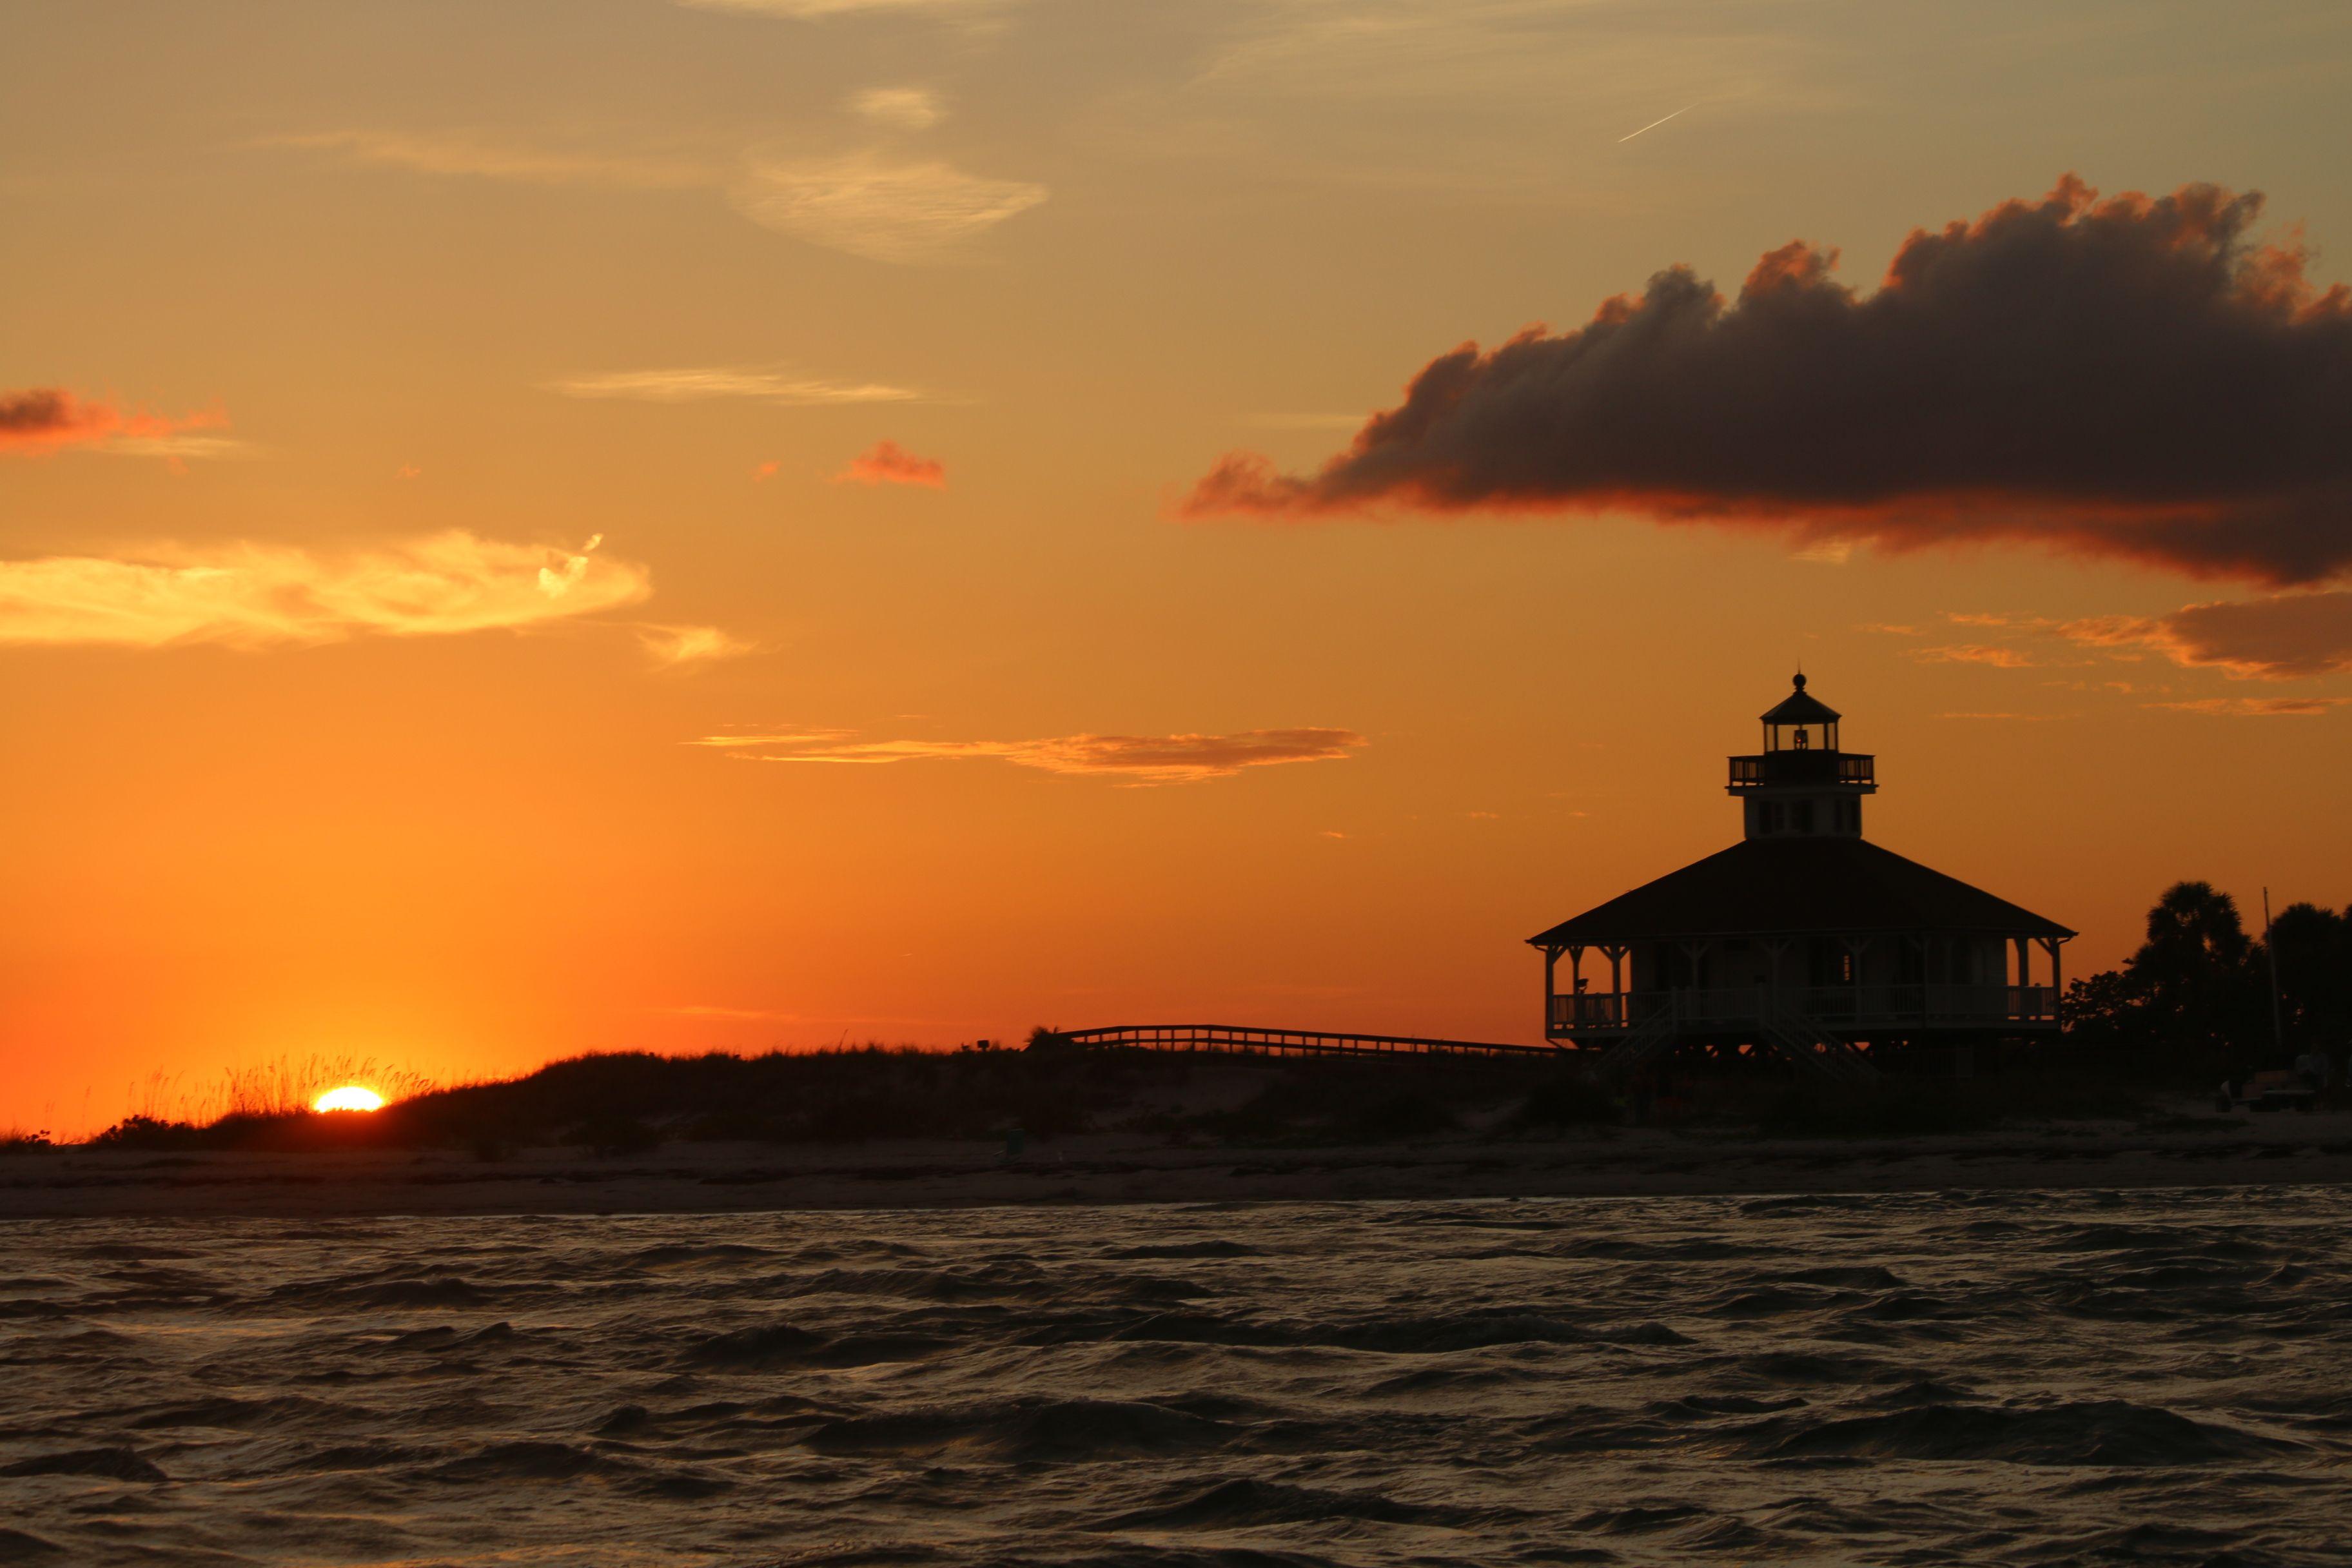 Boca grande sunset white sand beach sunset turquoise water